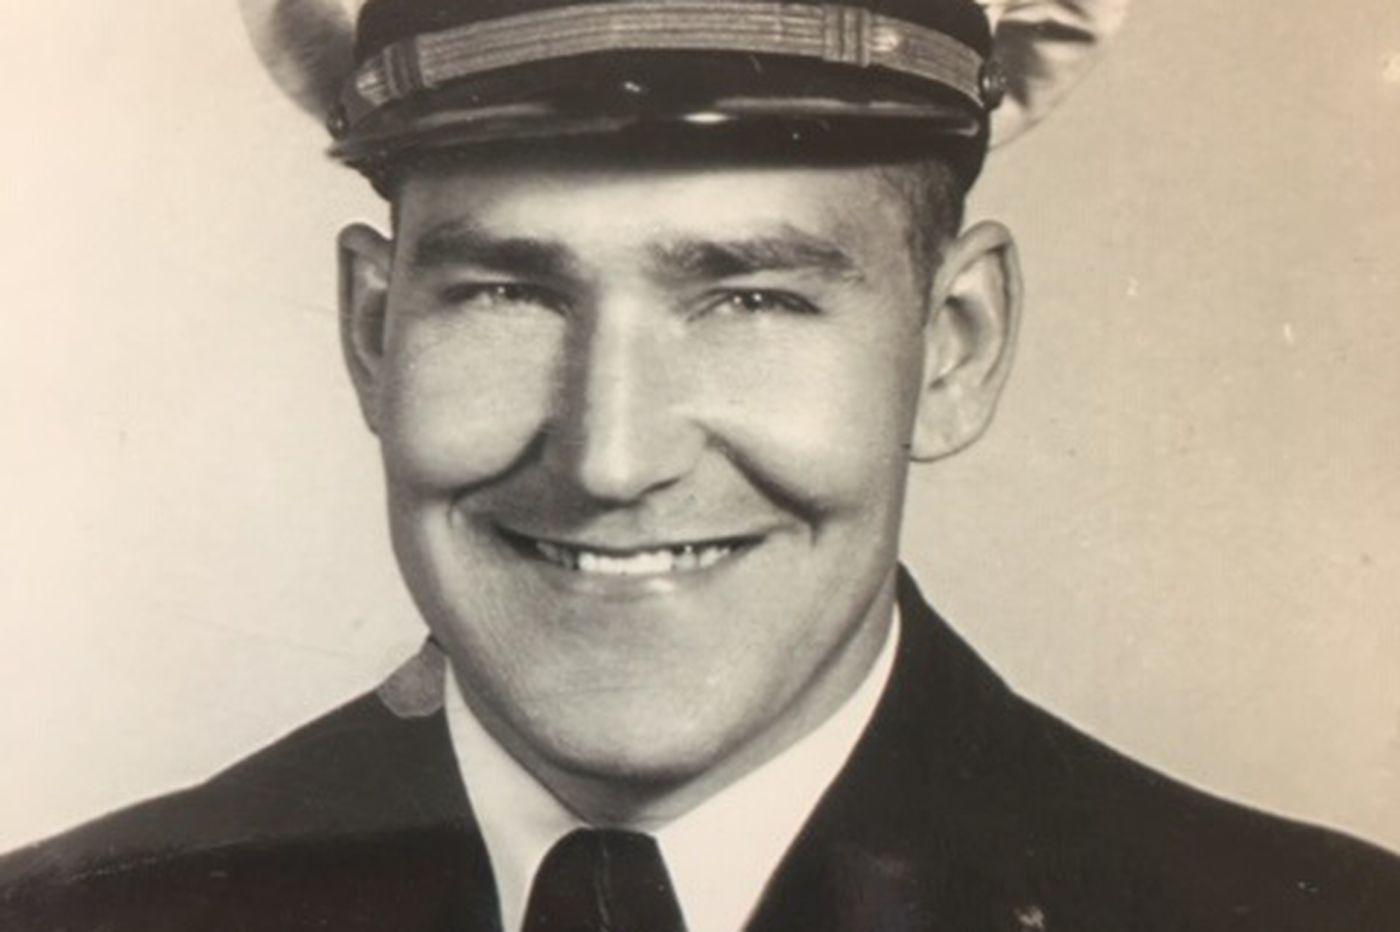 Lt. Commander Henry Rubner, a decorated World War II Naval aviator, dies at 98